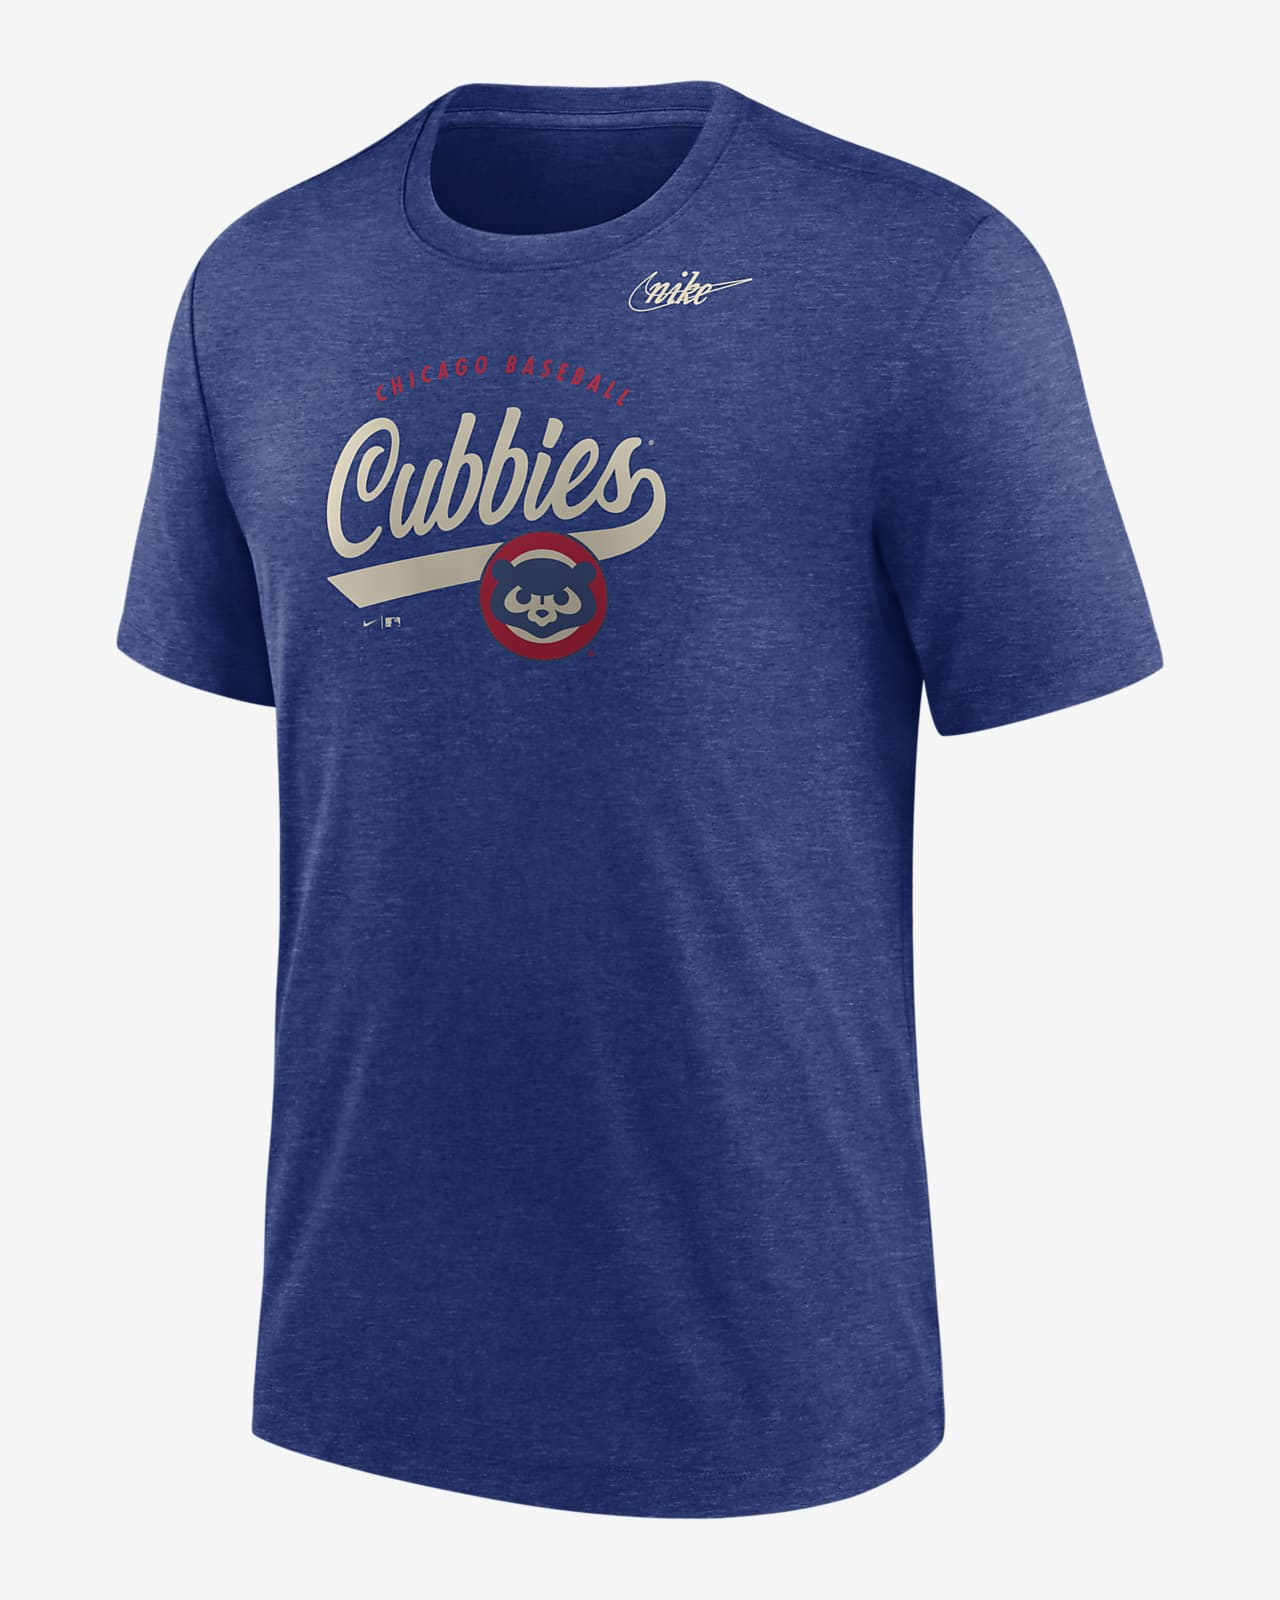 Nike Cooperstown Nickname (MLB Chicago Cubs) Men's T-Shirt